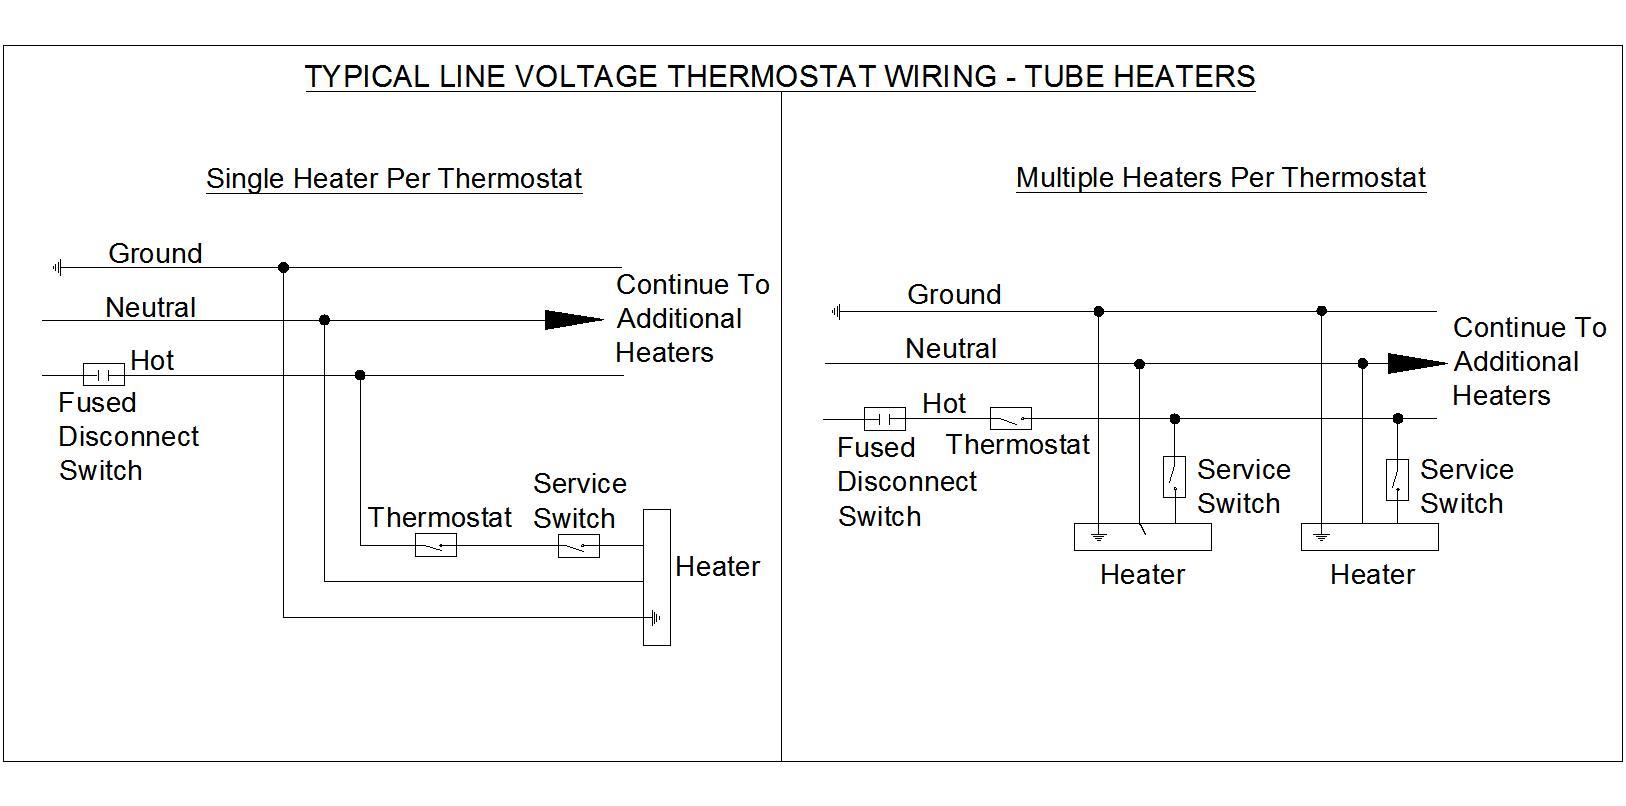 dayton gas heater wiring diagram free vehicle diagrams pdf radiant heaters great installation of schema rh 10 verena hoegerl de wall